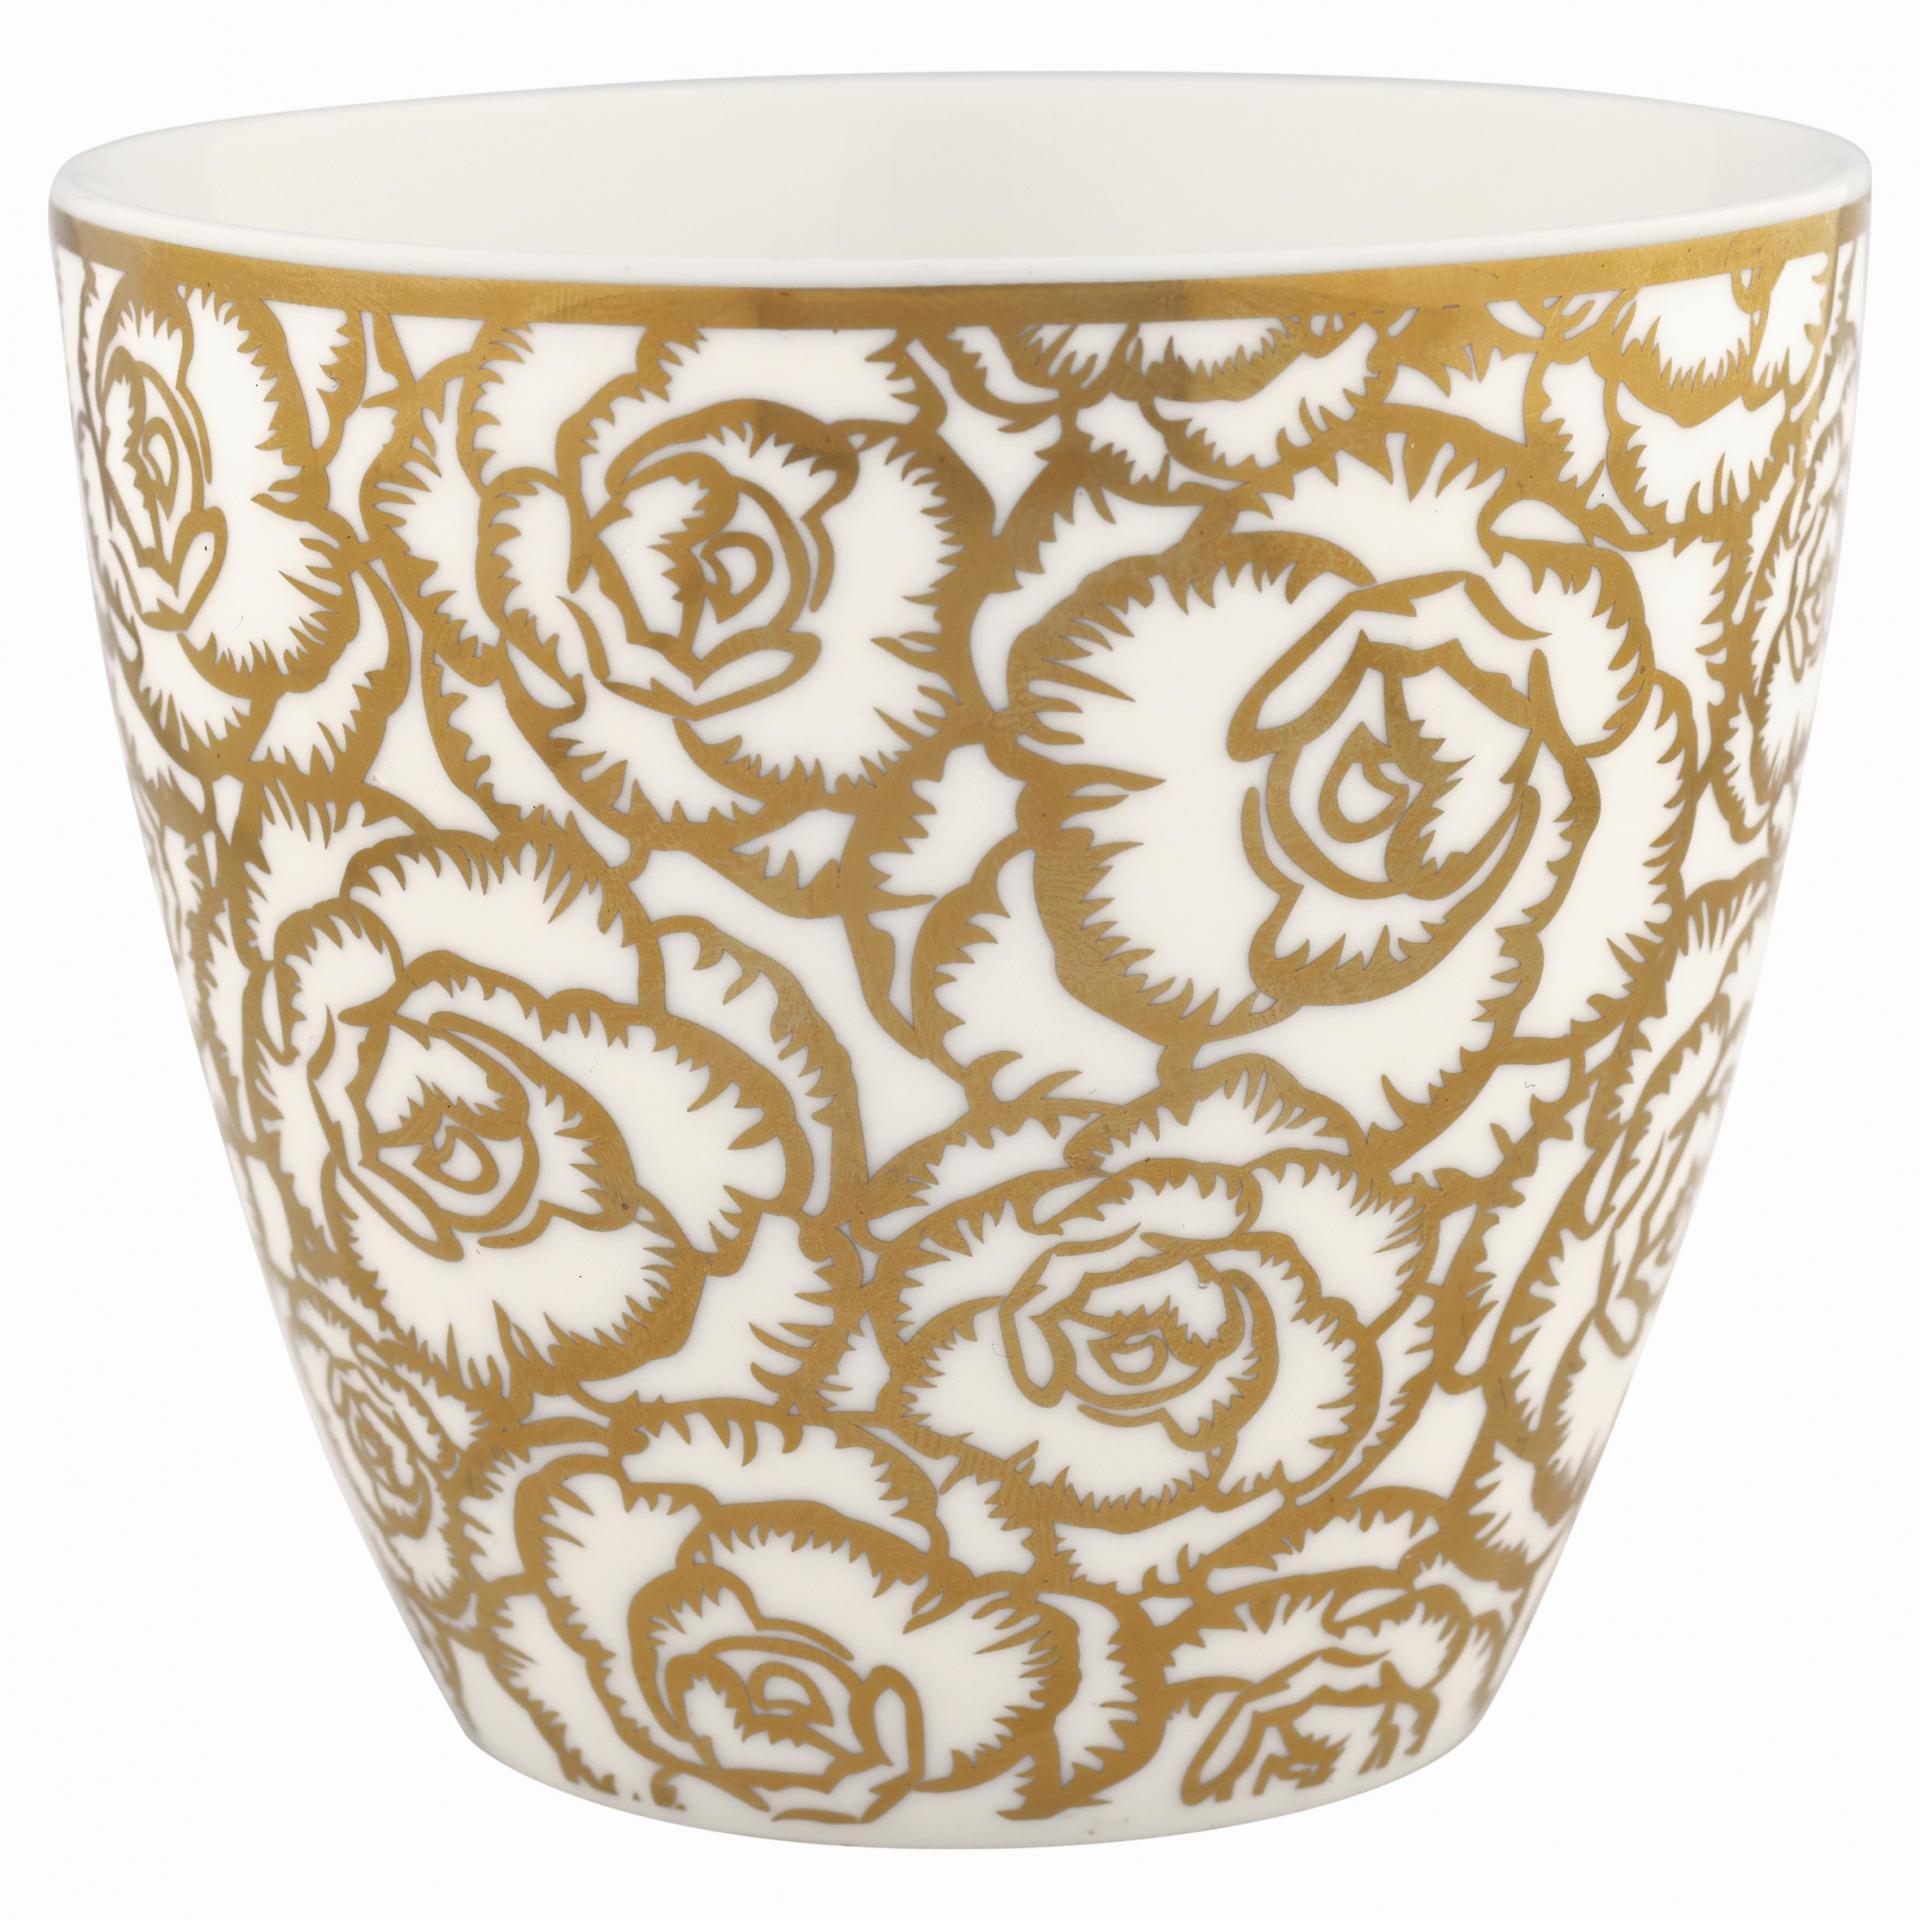 GREEN GATE Latte cup Blossom gold Gate Noir 300ml, bílá barva, zlatá barva, porcelán 300 ml